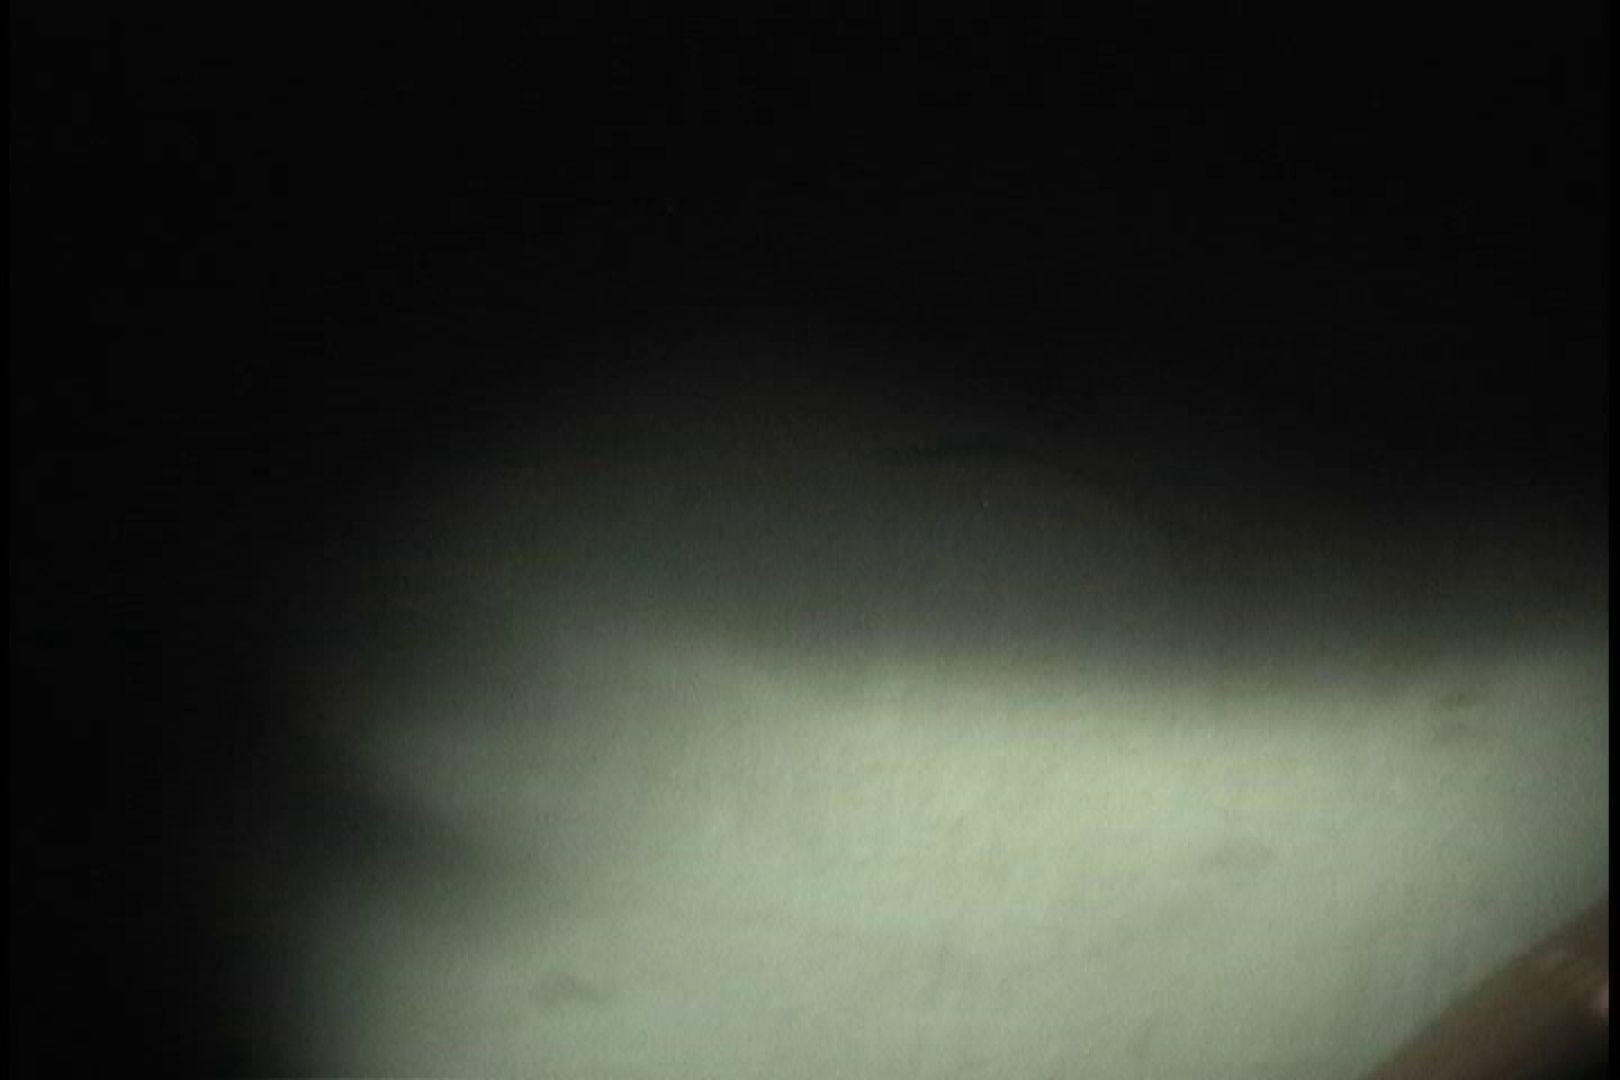 No.26 腰にタトゥー、バックスジマン発見! シャワー室   シャワー  113画像 81